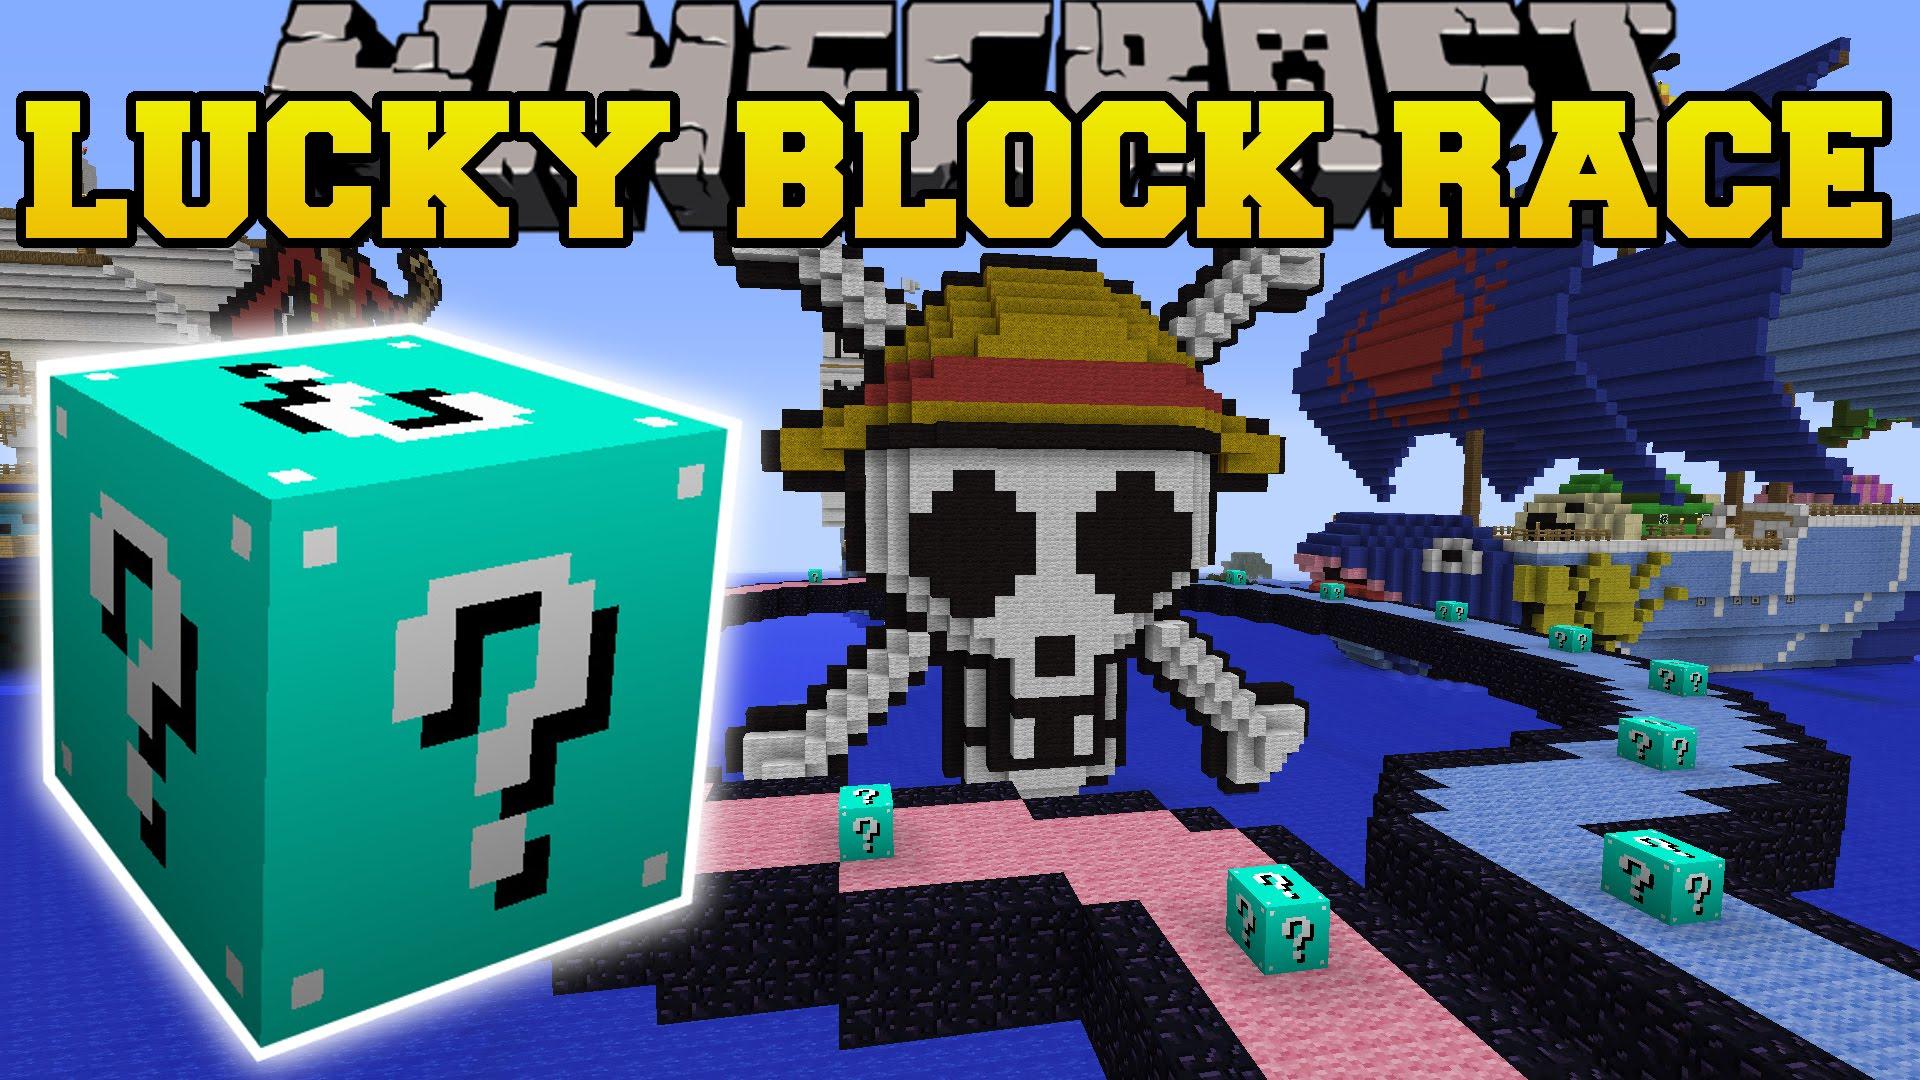 The Luckiest Block - Lucky Block Race скриншот 1